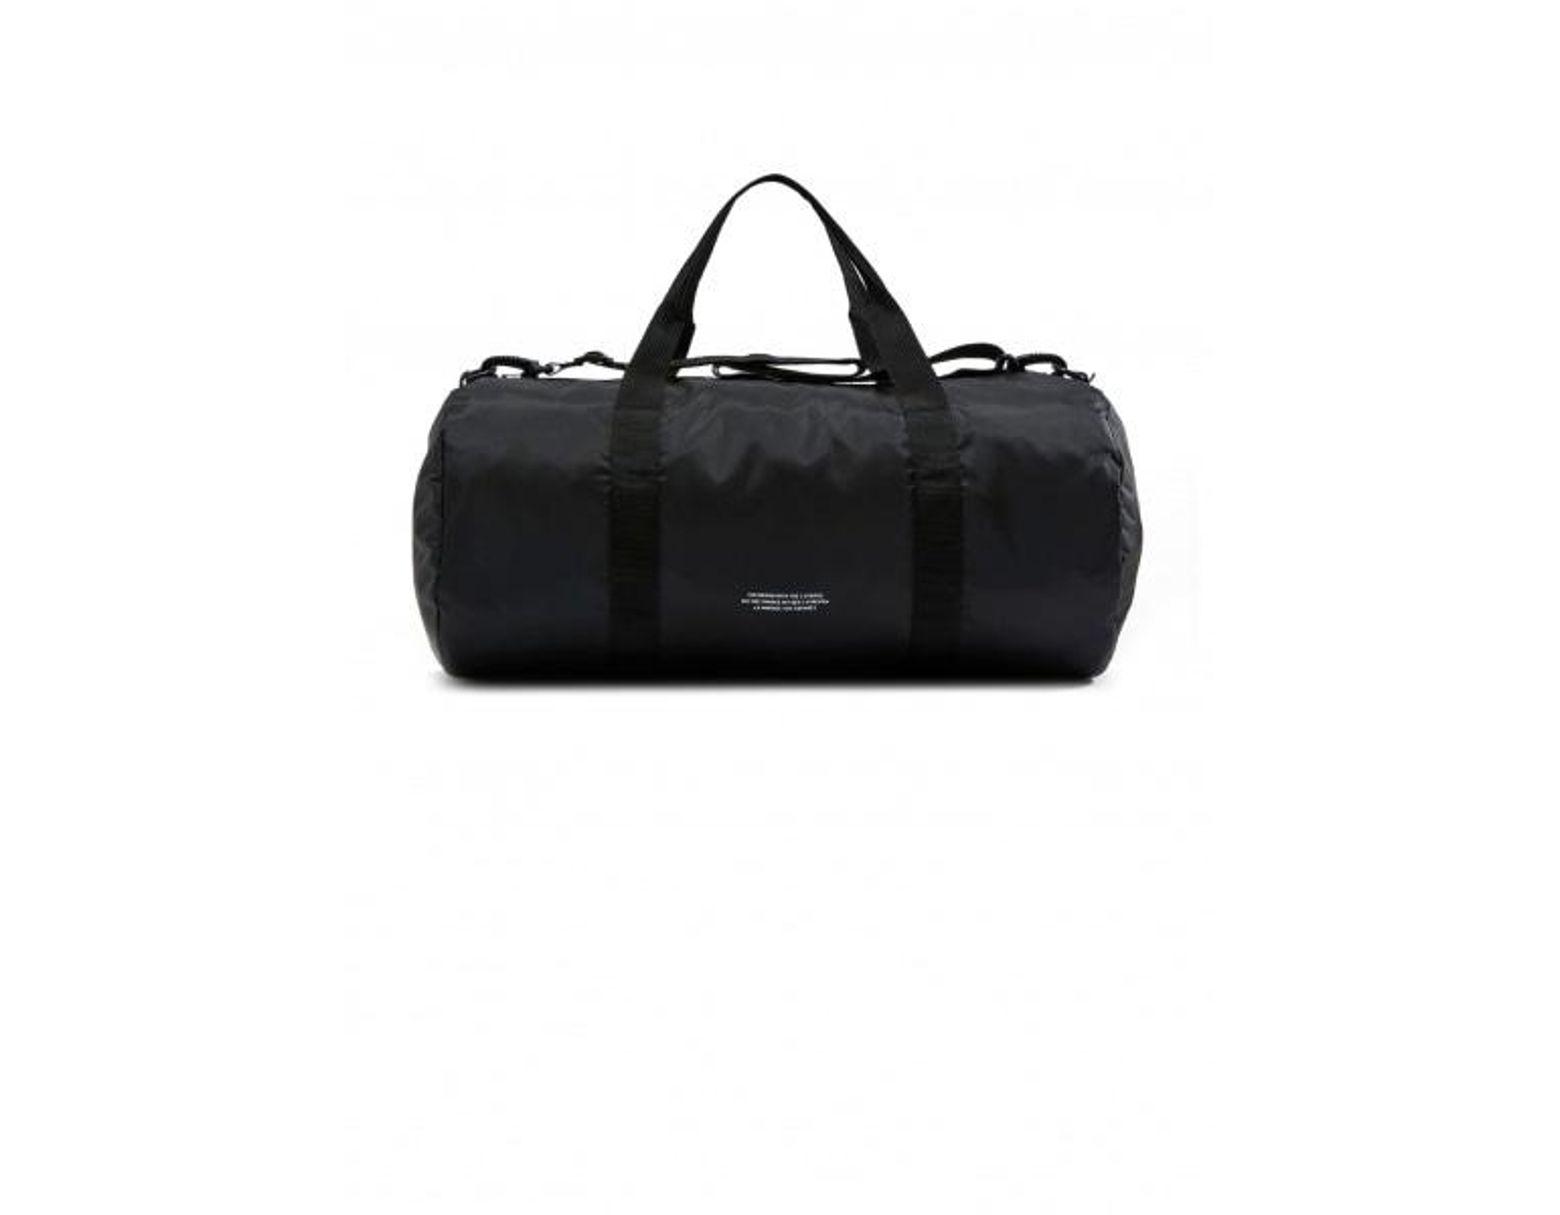 25926579a73 adidas Originals Ac Duffle in Black for Men - Lyst